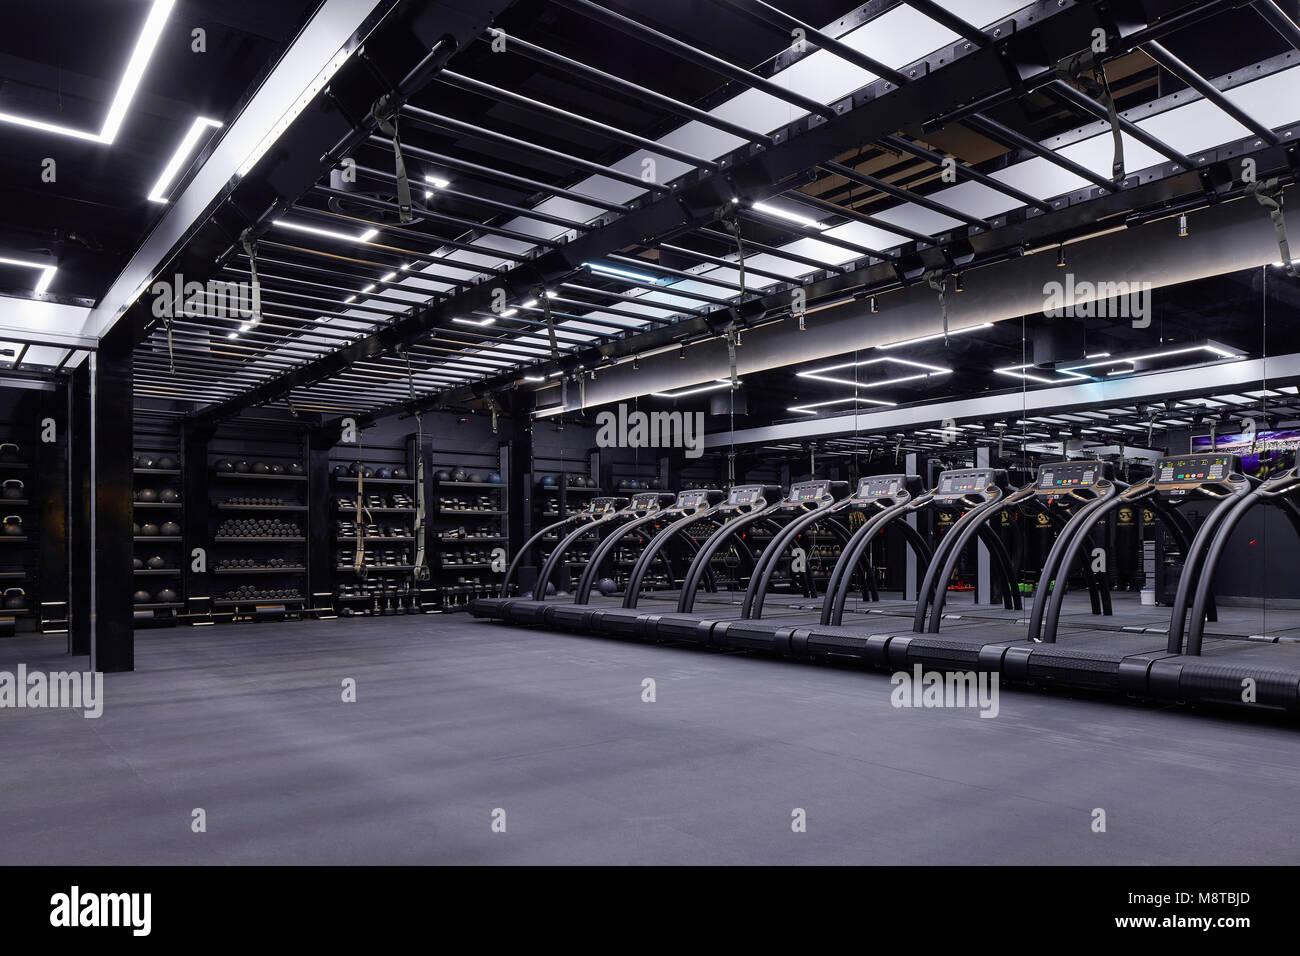 Fitness studio. KXU London, London, United Kingdom. Architect: Stiff + Trevillion Architects, 2017. - Stock Image